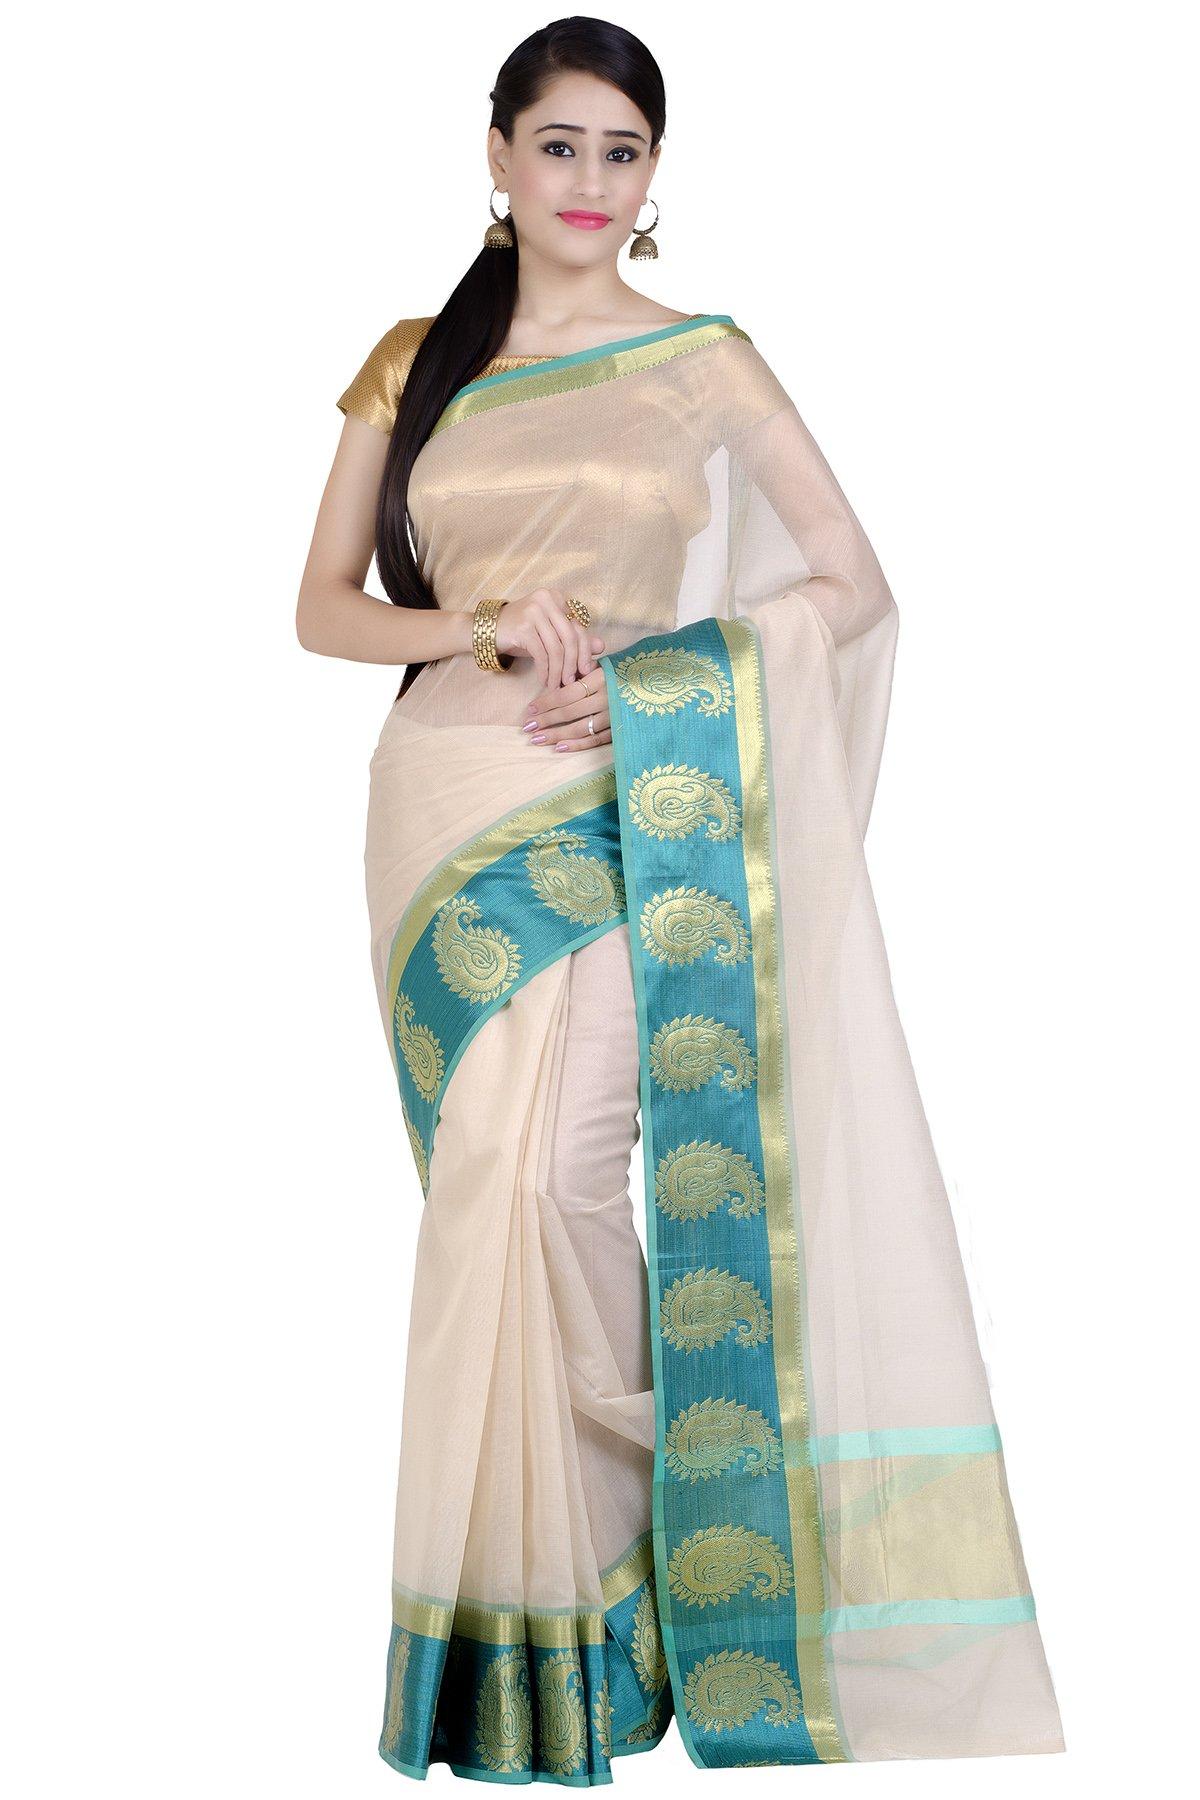 Chandrakala Women's Green Supernet Cotton Banarasi Saree(1276GRE)